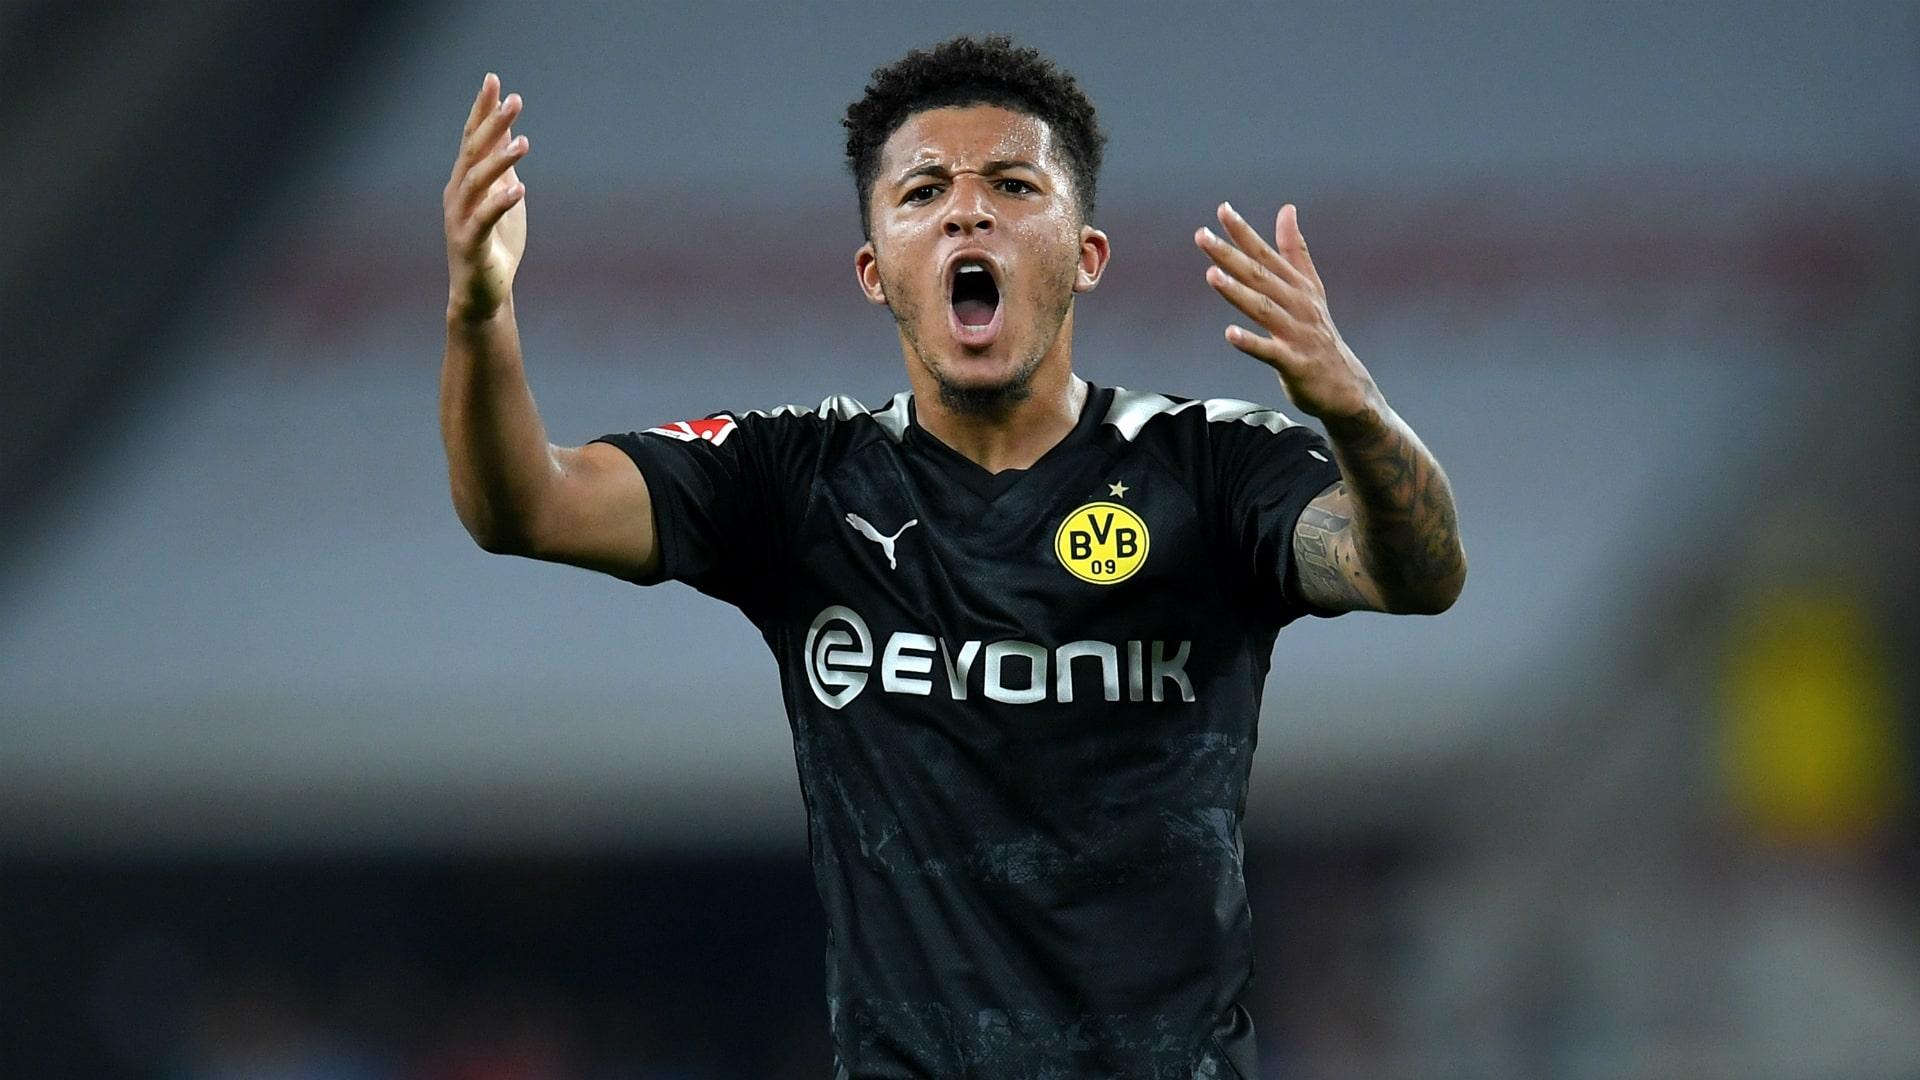 Hertha Berlin vs Borussia Dortmund Free Betting Prediction